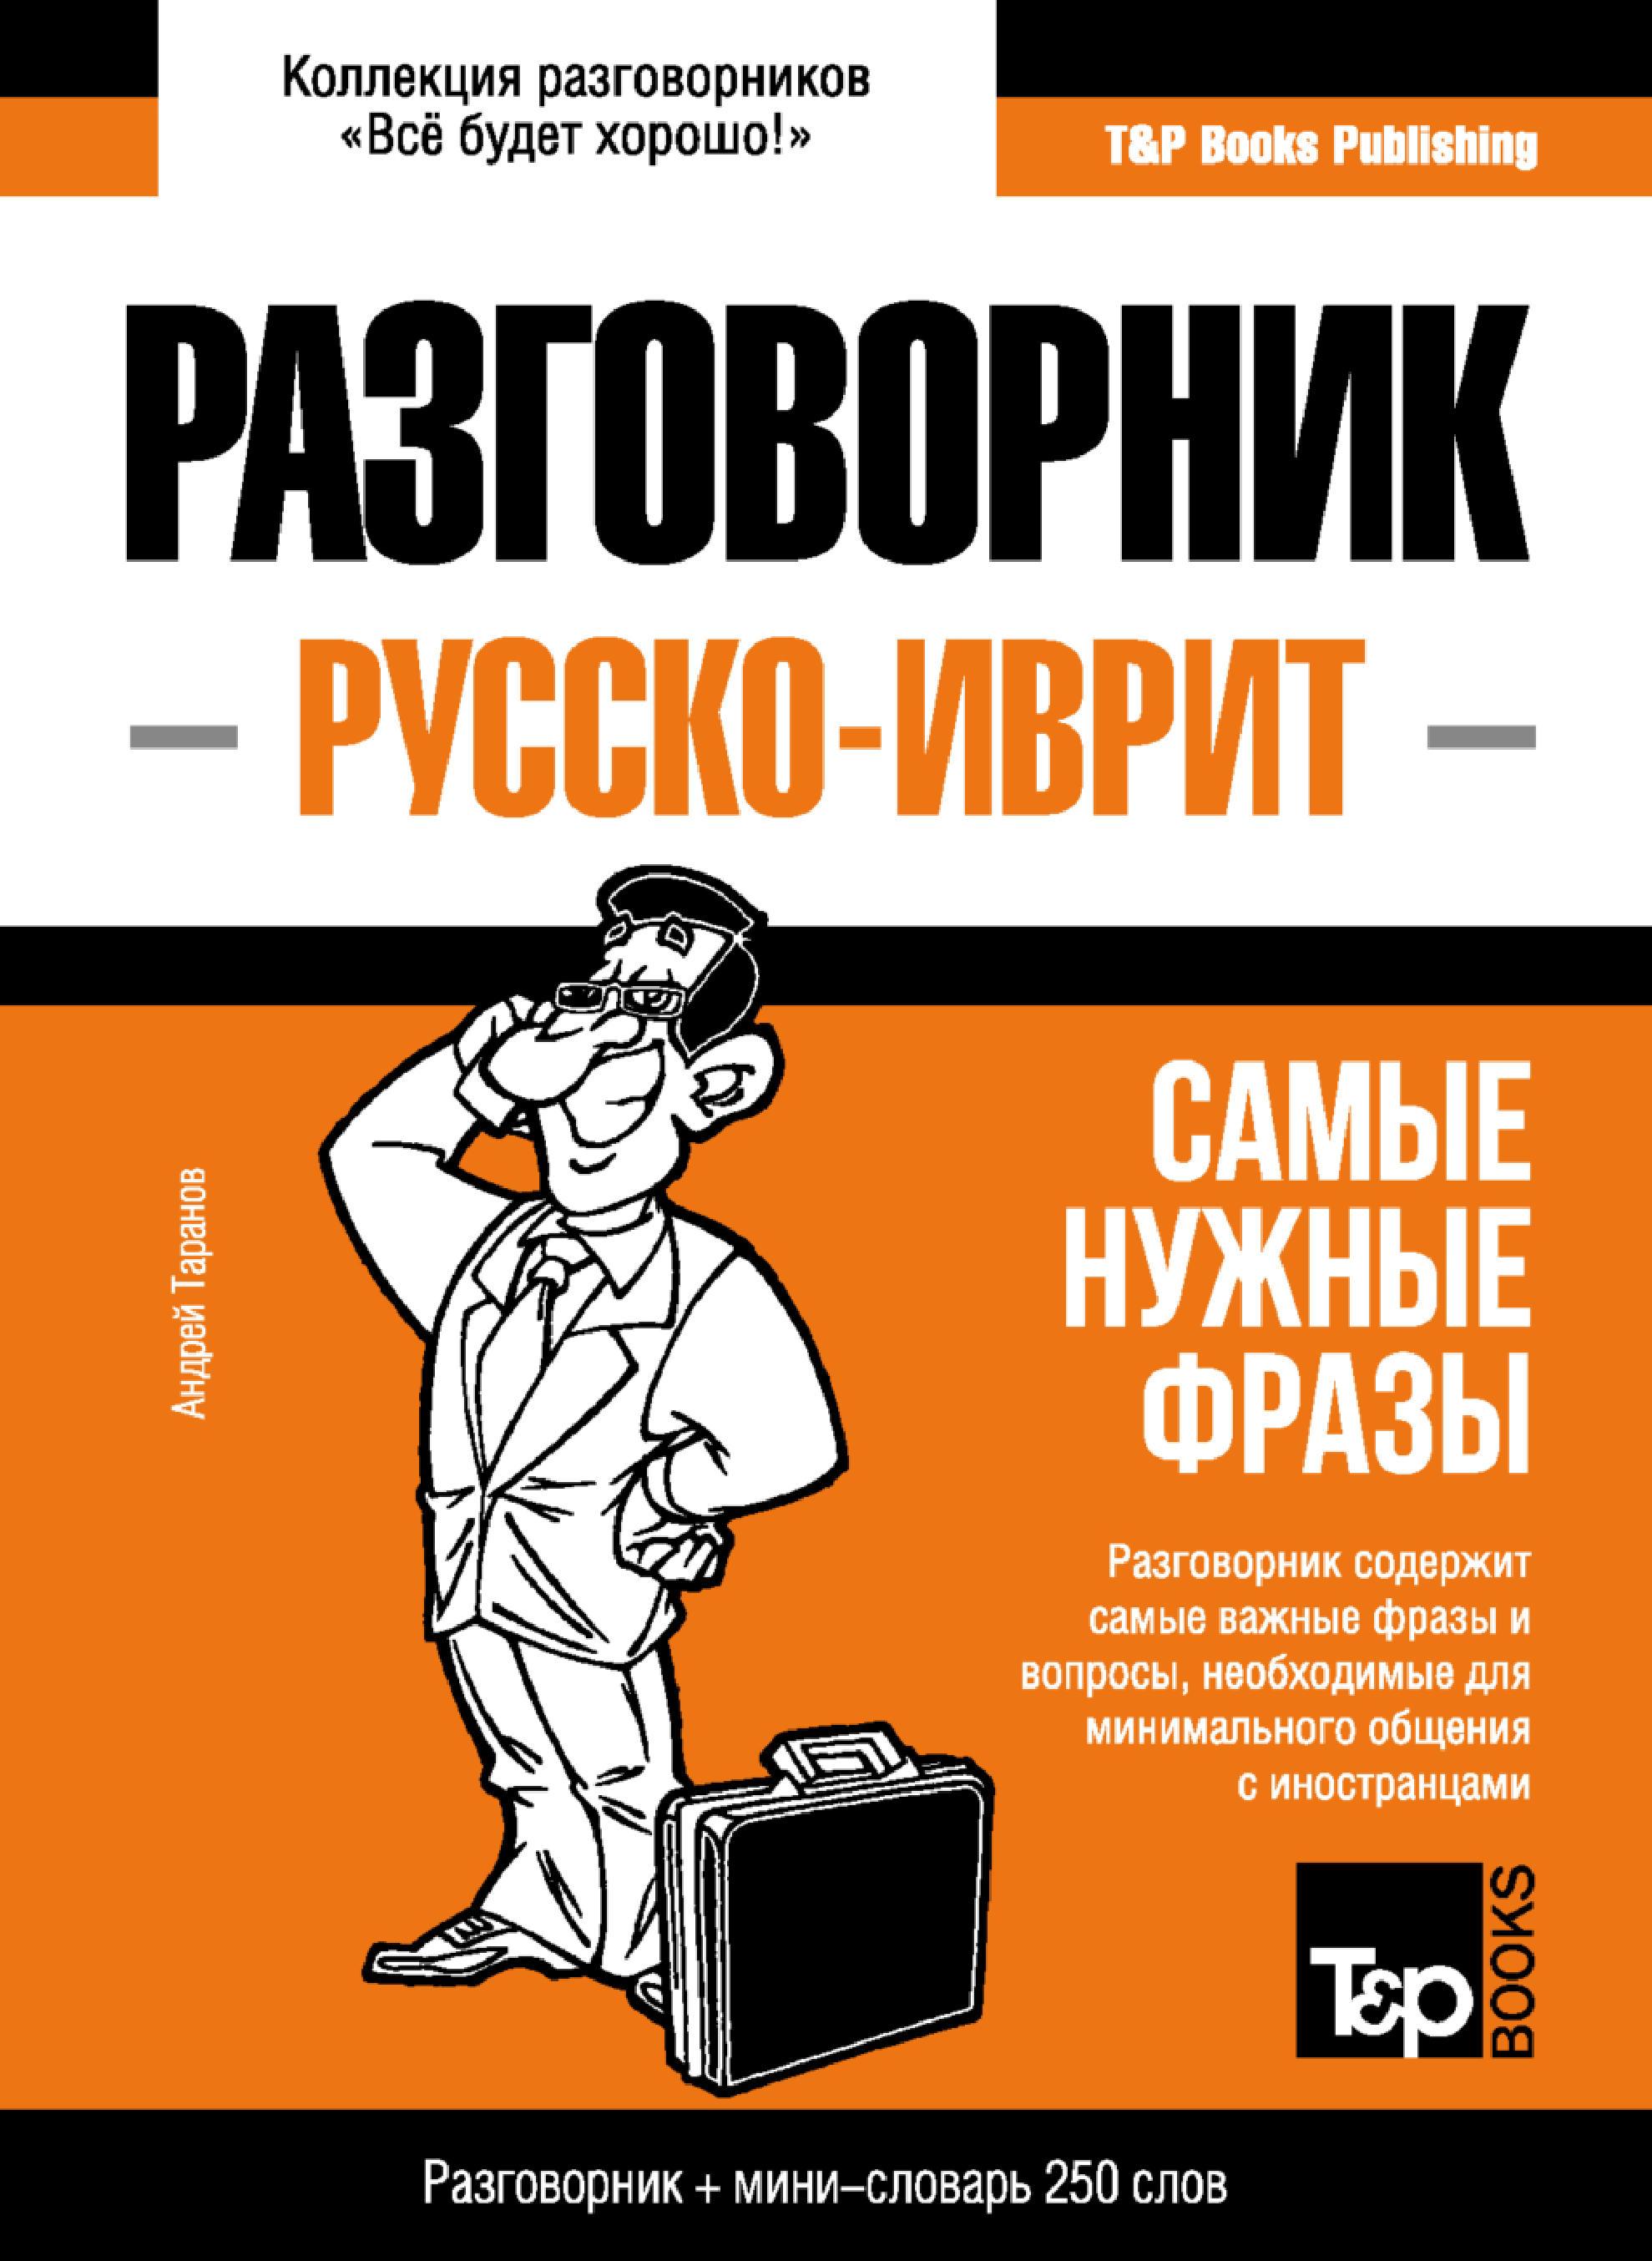 Андрей Таранов Иврит разговорник и мини-словарь андрей усачёв има аба и другие путешествие в иврит